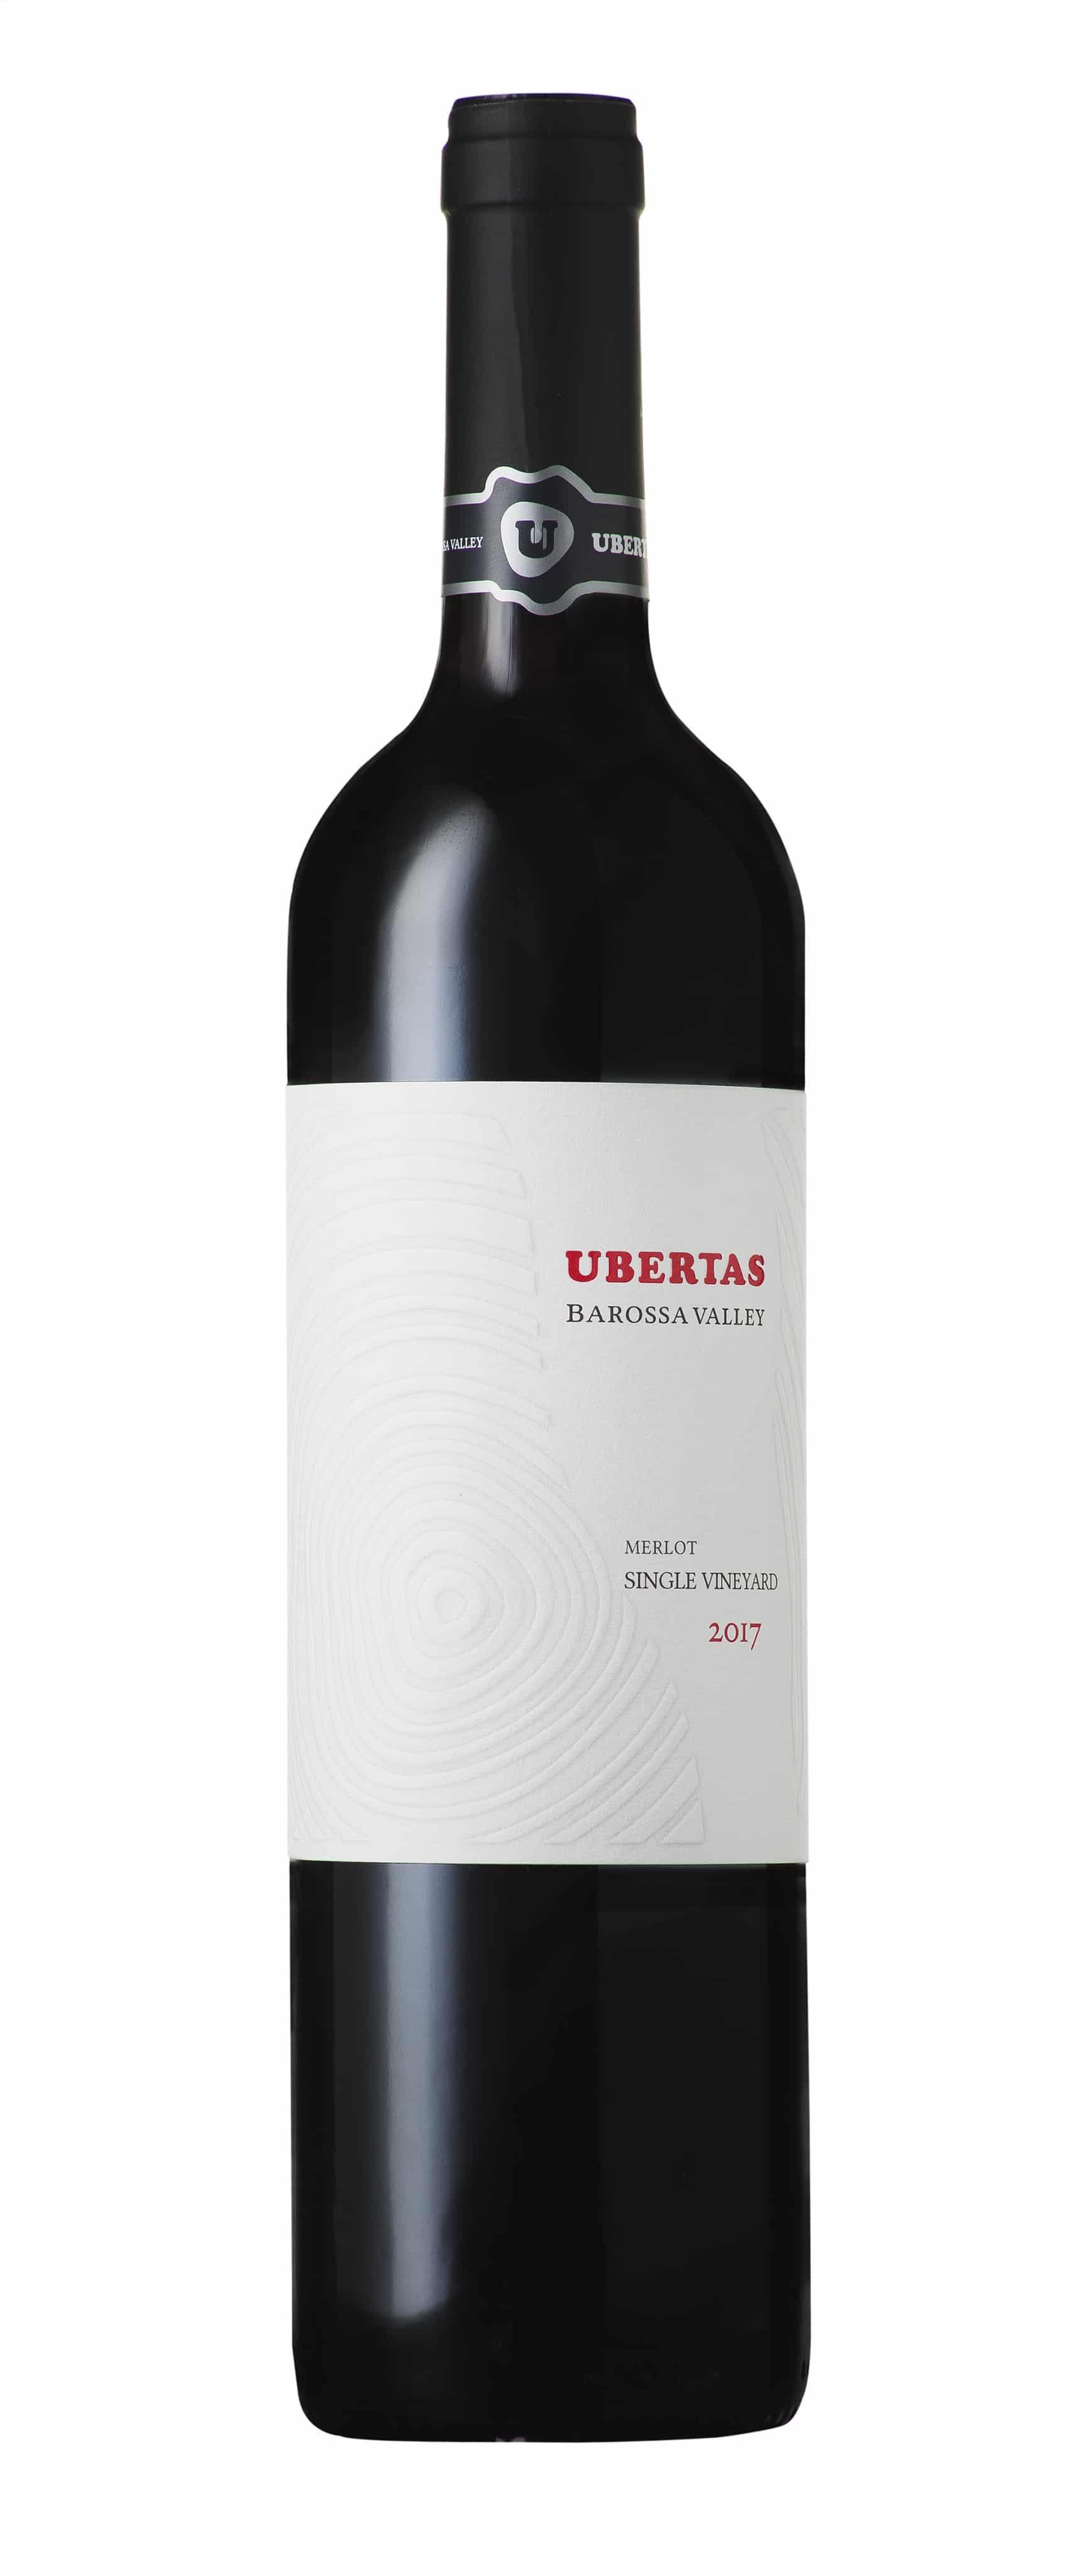 UBERTAS wines Merlot